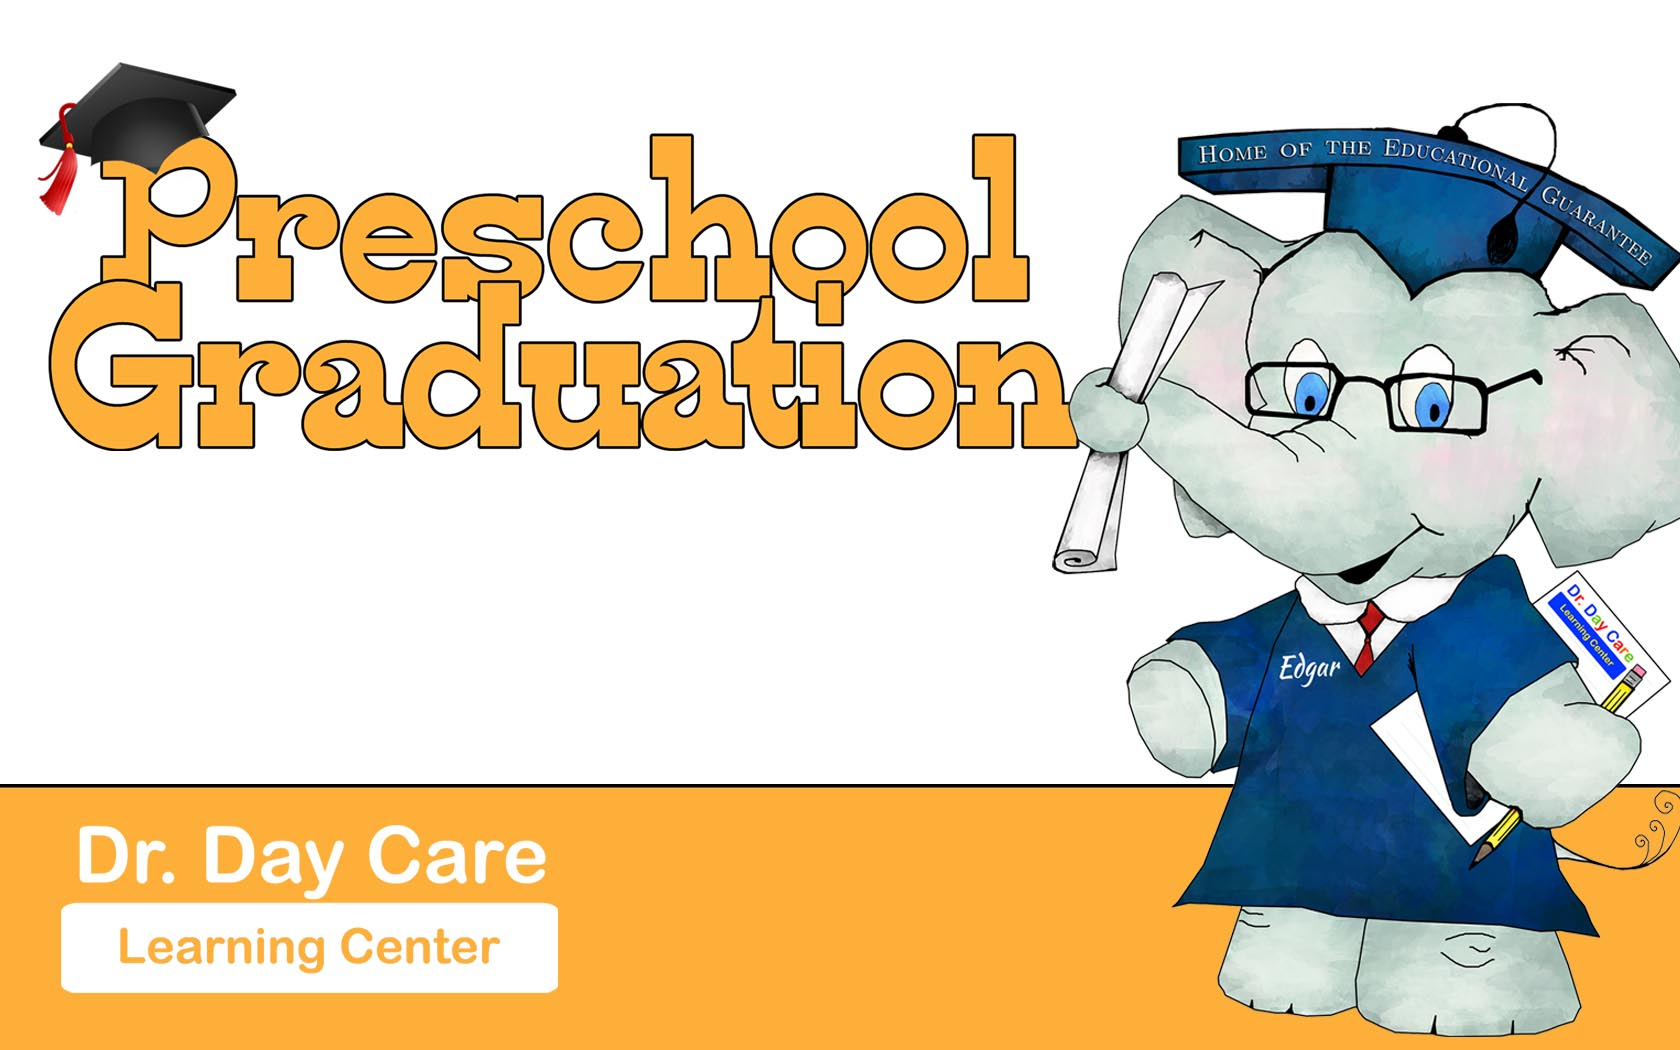 ddc foster preschool graduation dr day care